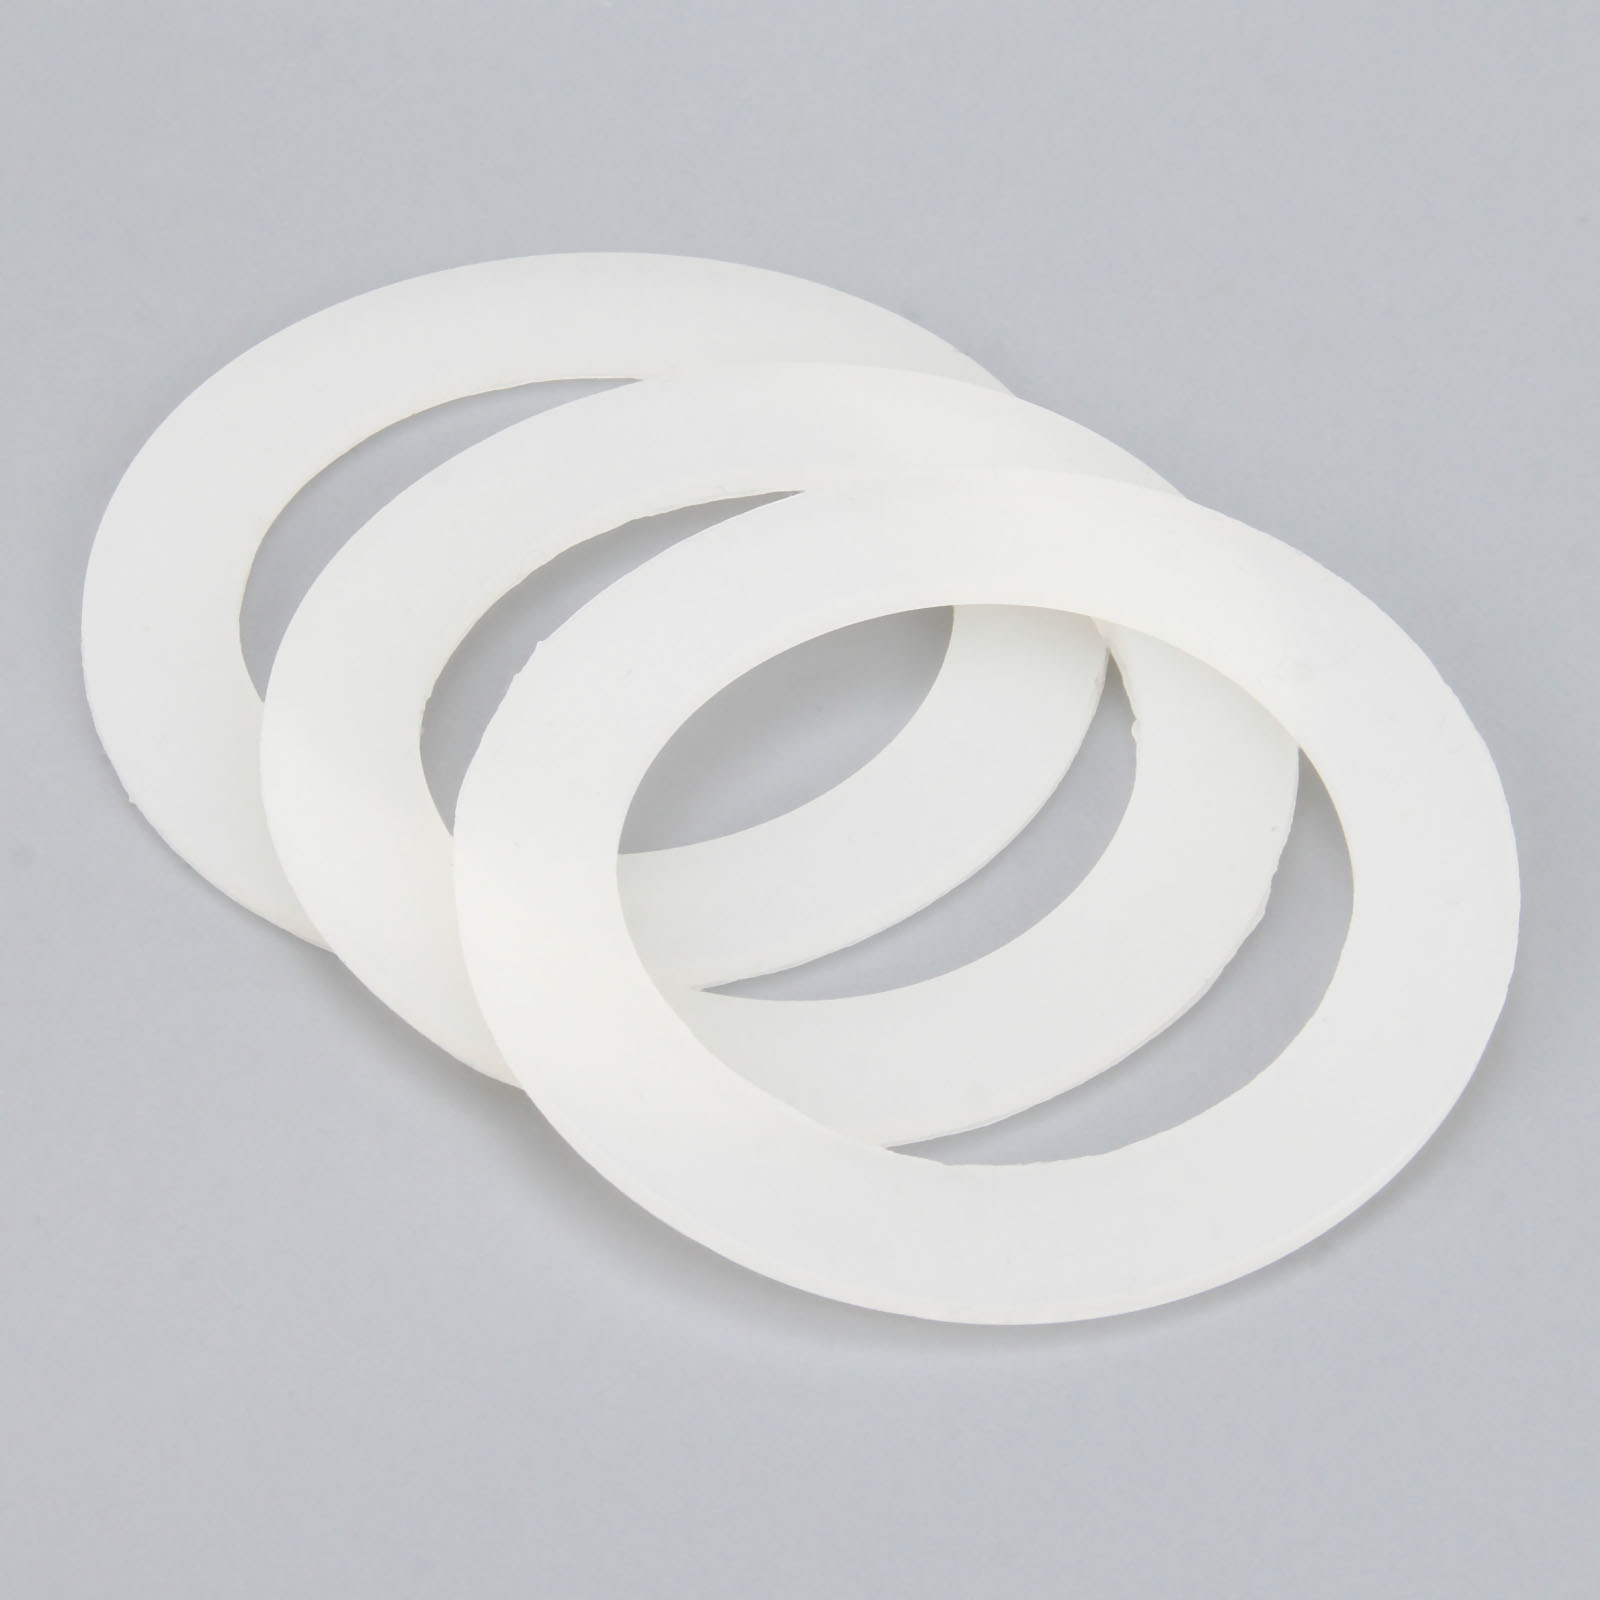 3Pcs Replacement Blender Sealing Gasket O-ring Fit For Cuisinart Blender 65mm CUCB-456-3